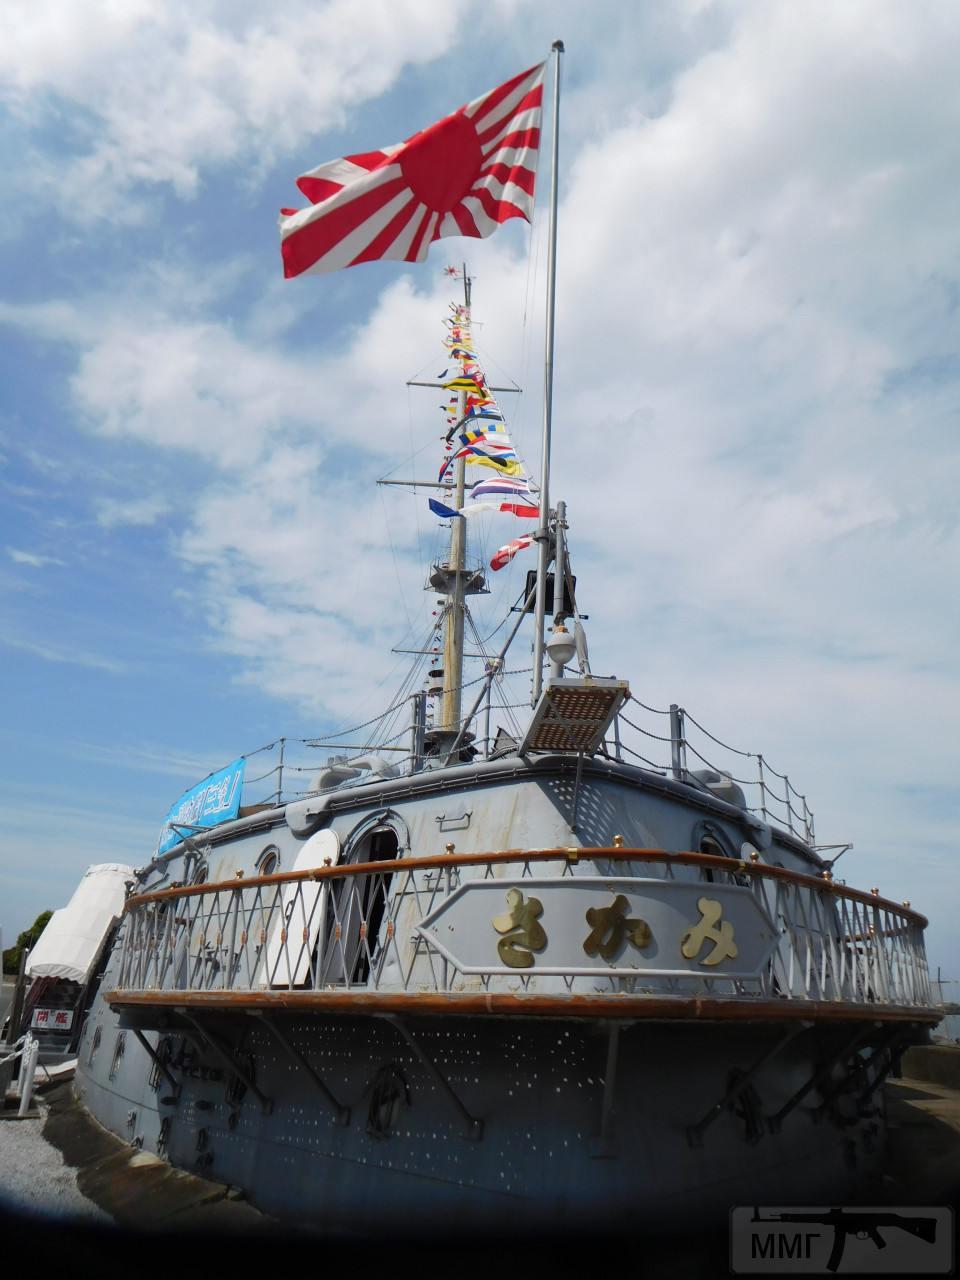 104216 - Броненосец Mikasa 三笠 (Япония)